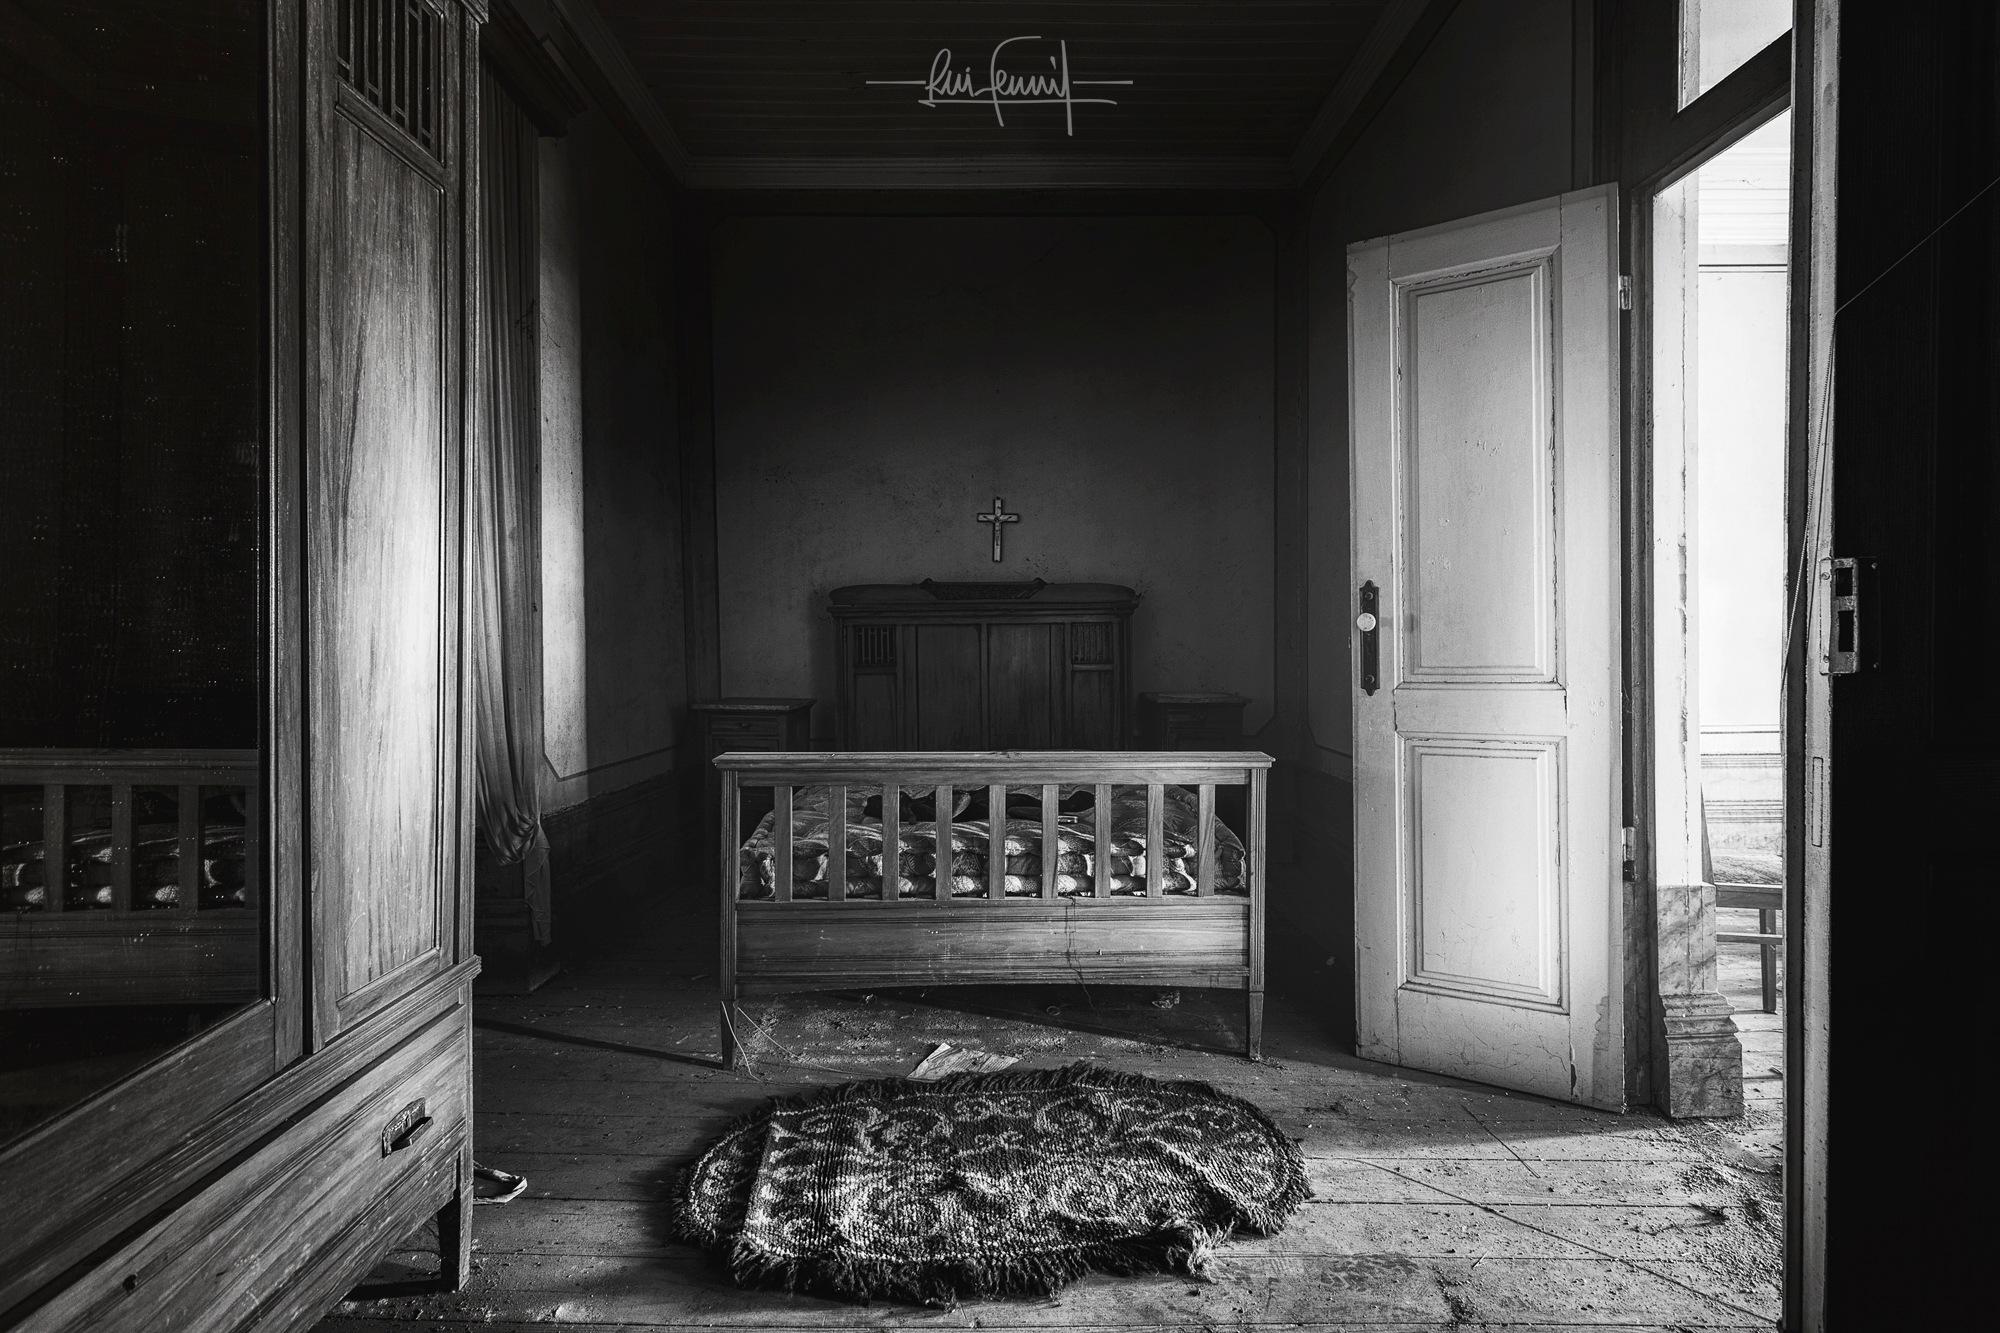 Sleepless Nights by Rui Ferreira